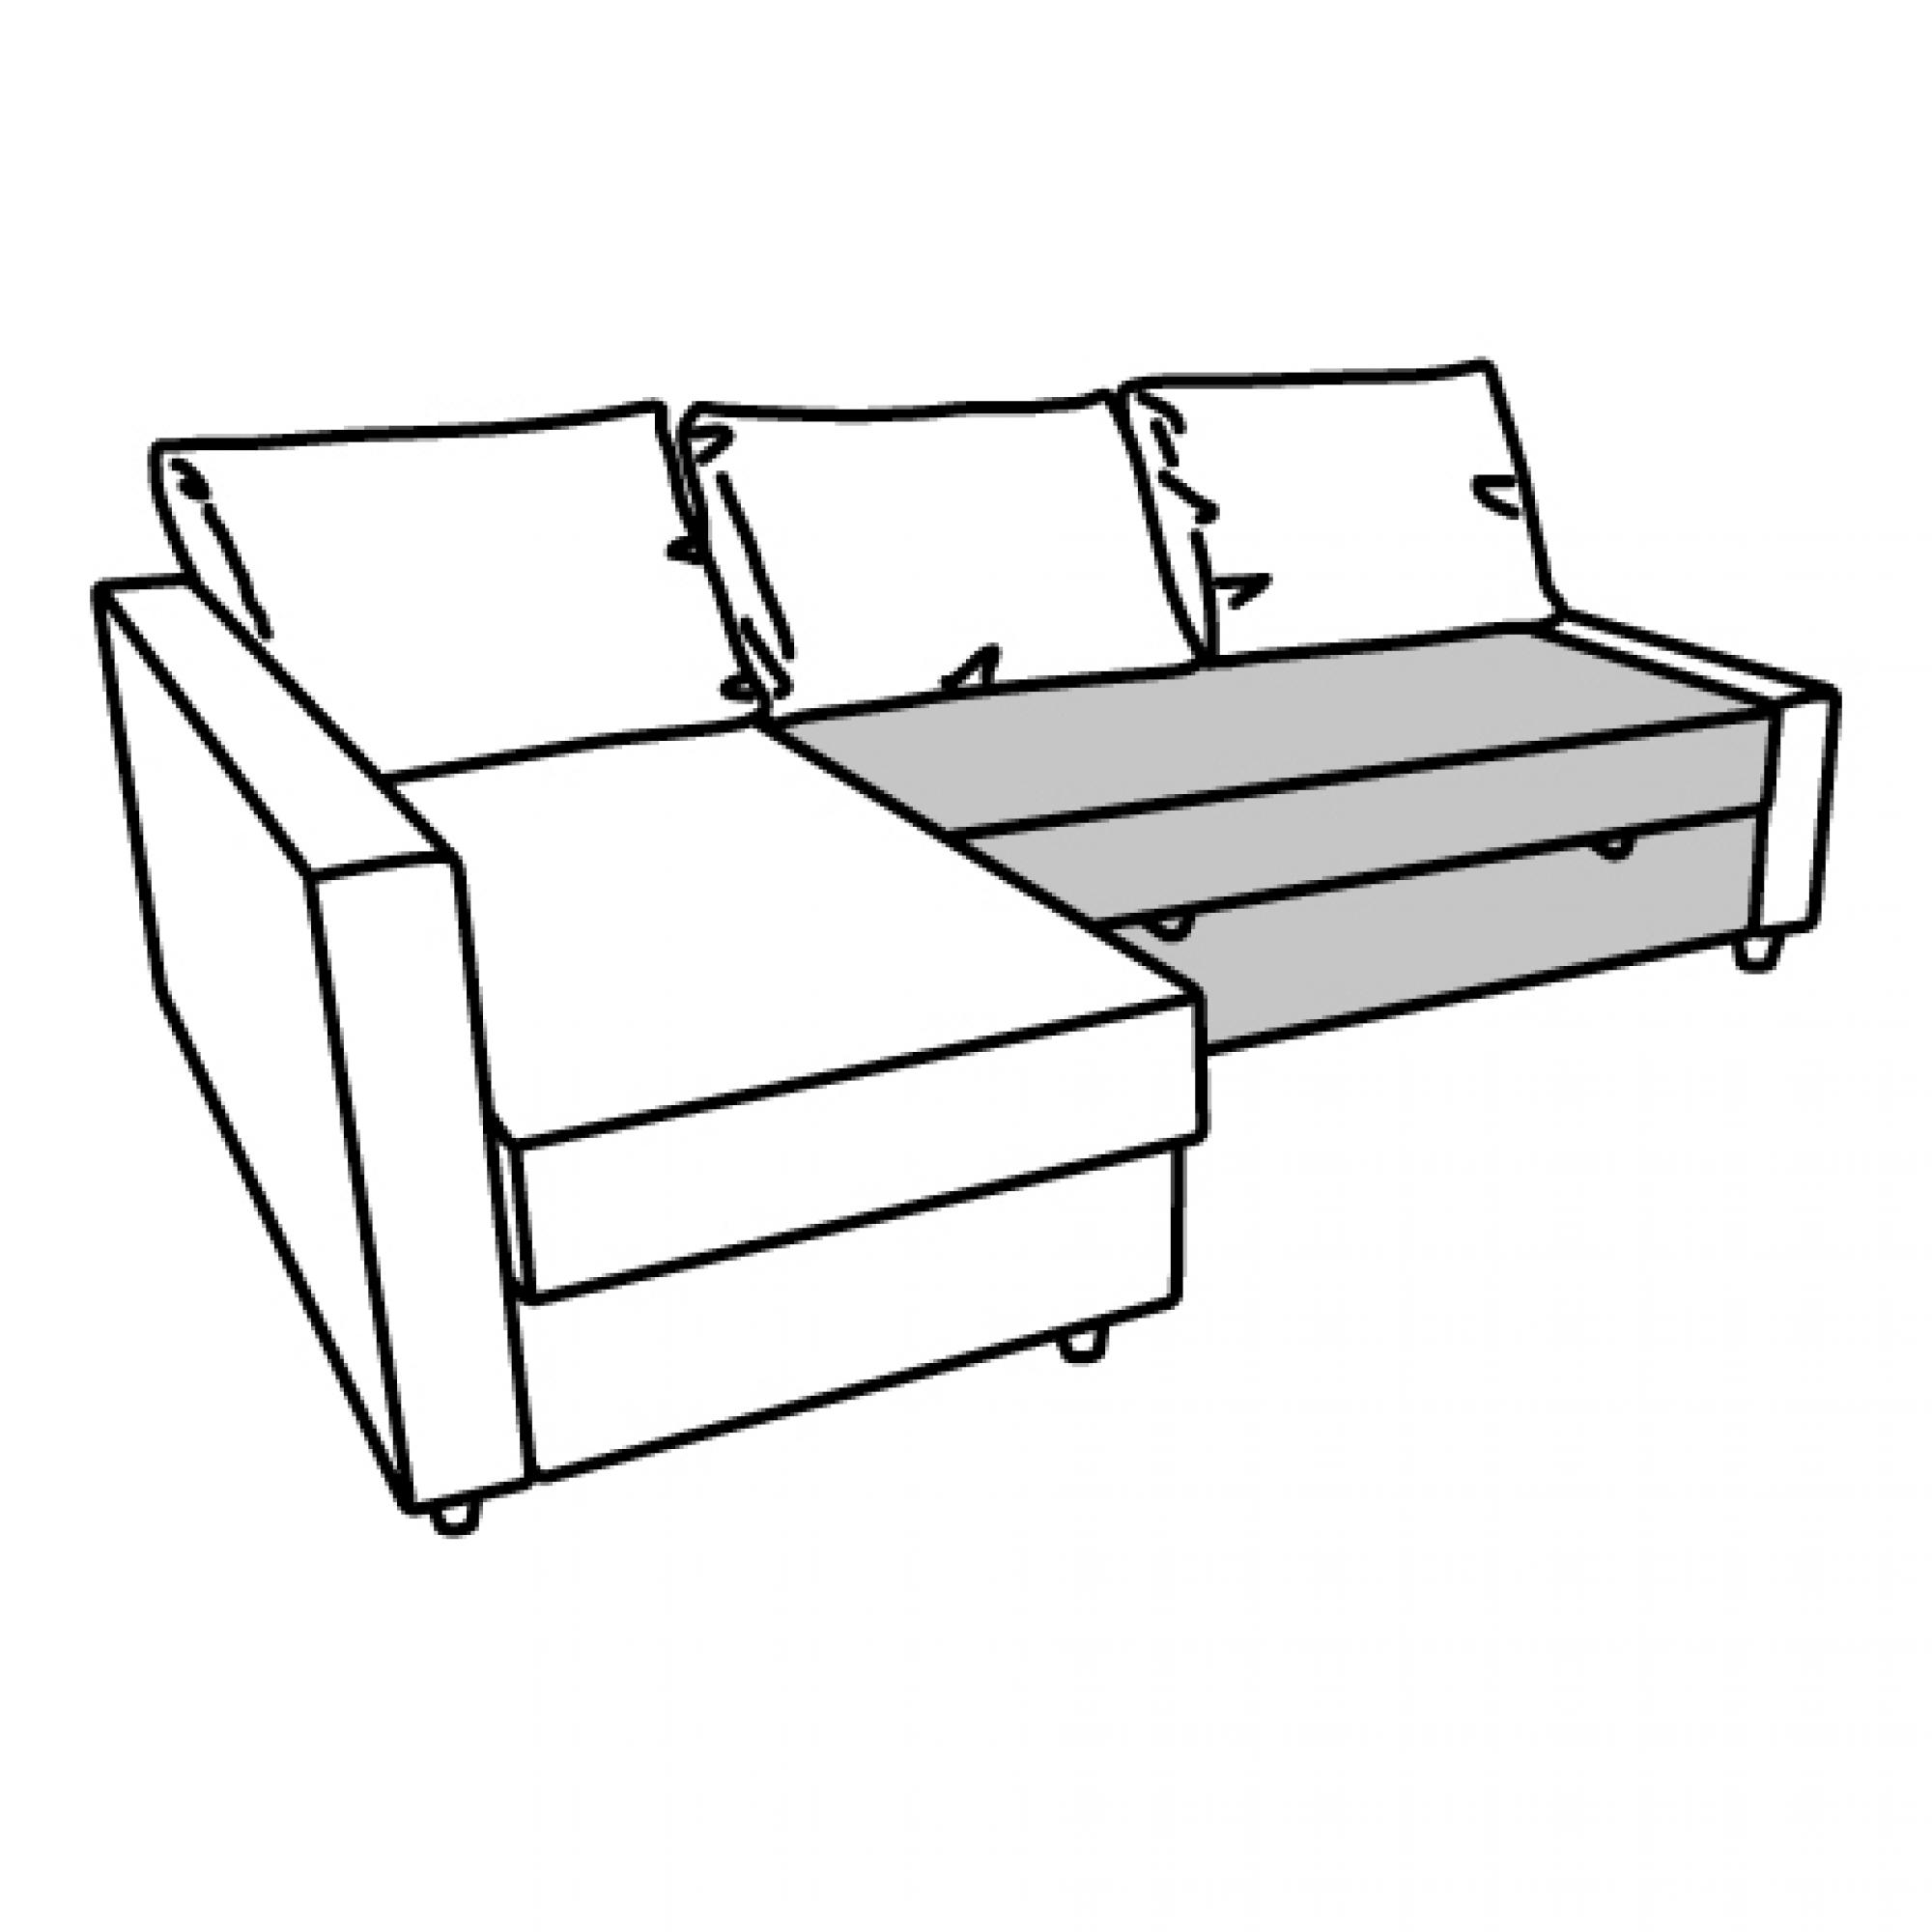 2000x2000 Friheten Seat Section For Corner Sofa Bed Orange